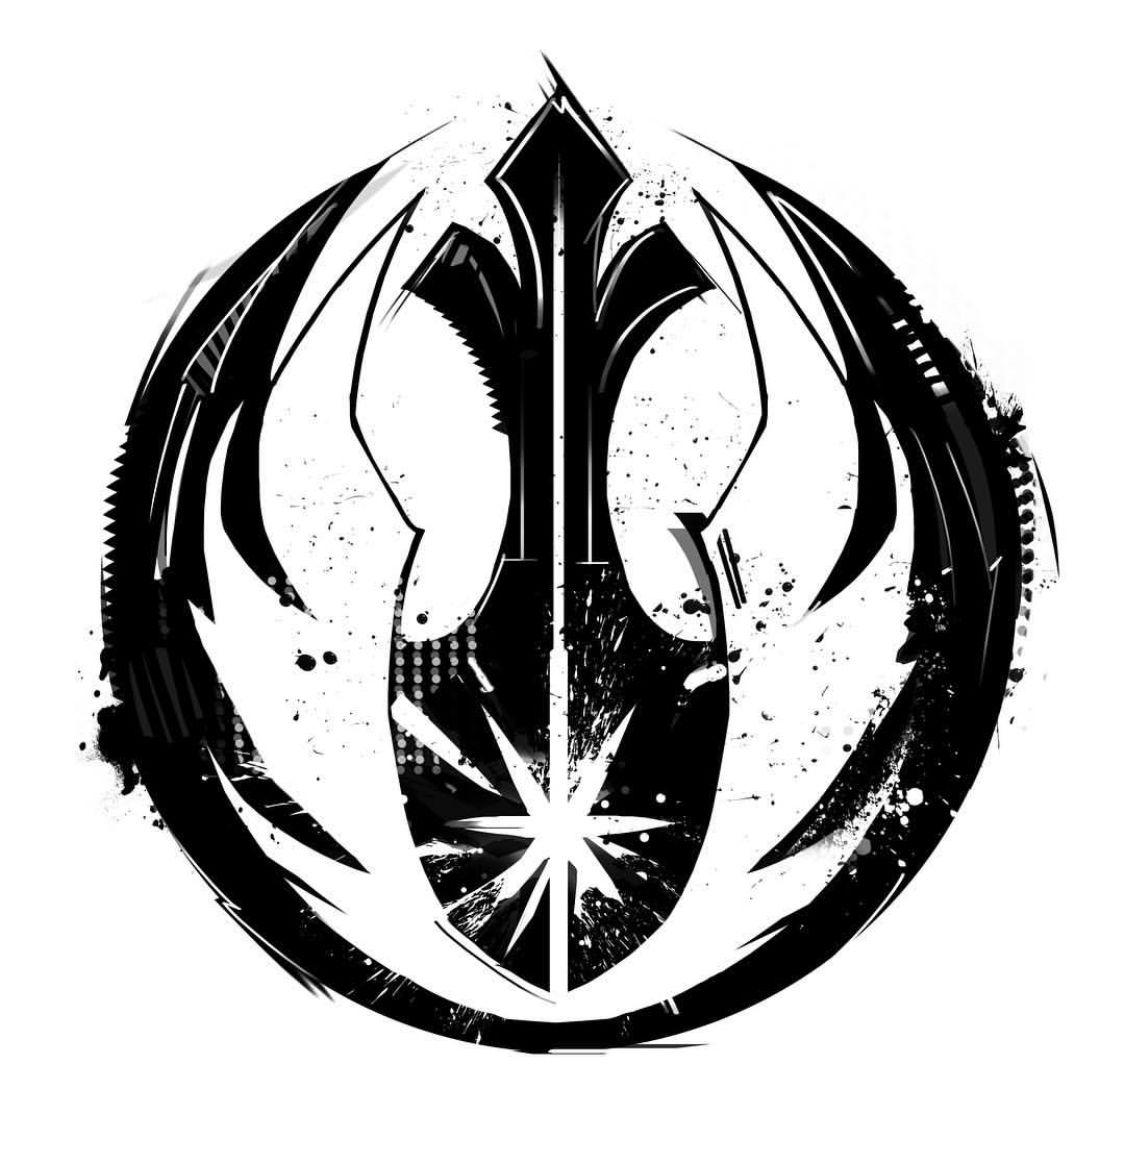 Pin By Jonathan Marini On Star Wars Star Wars Artwork Star Wars Art Star Wars Concept Art